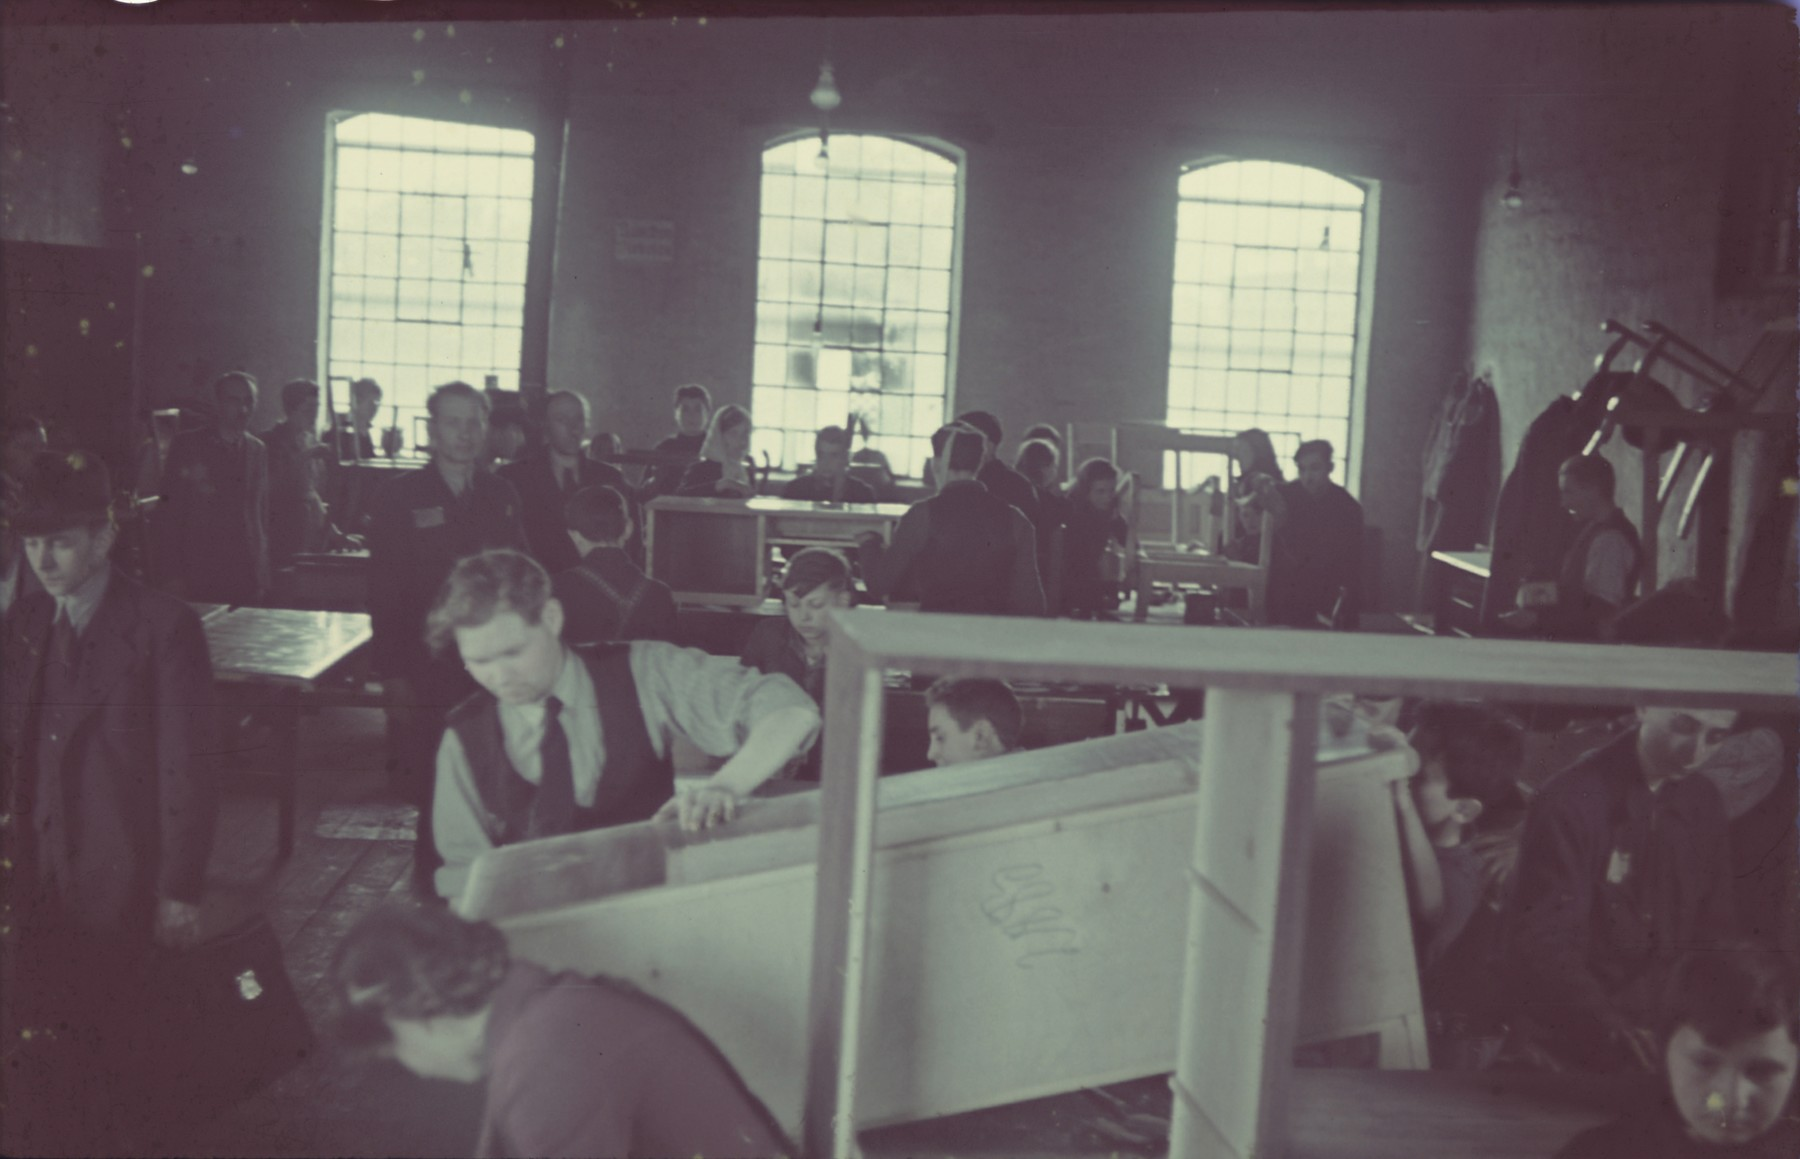 "Carpenters work in the Lodz ghetto furniture factory.  Original German caption: ""Litzmannstadt Getto: Moebelfabrik"" (furniture factory), #8."